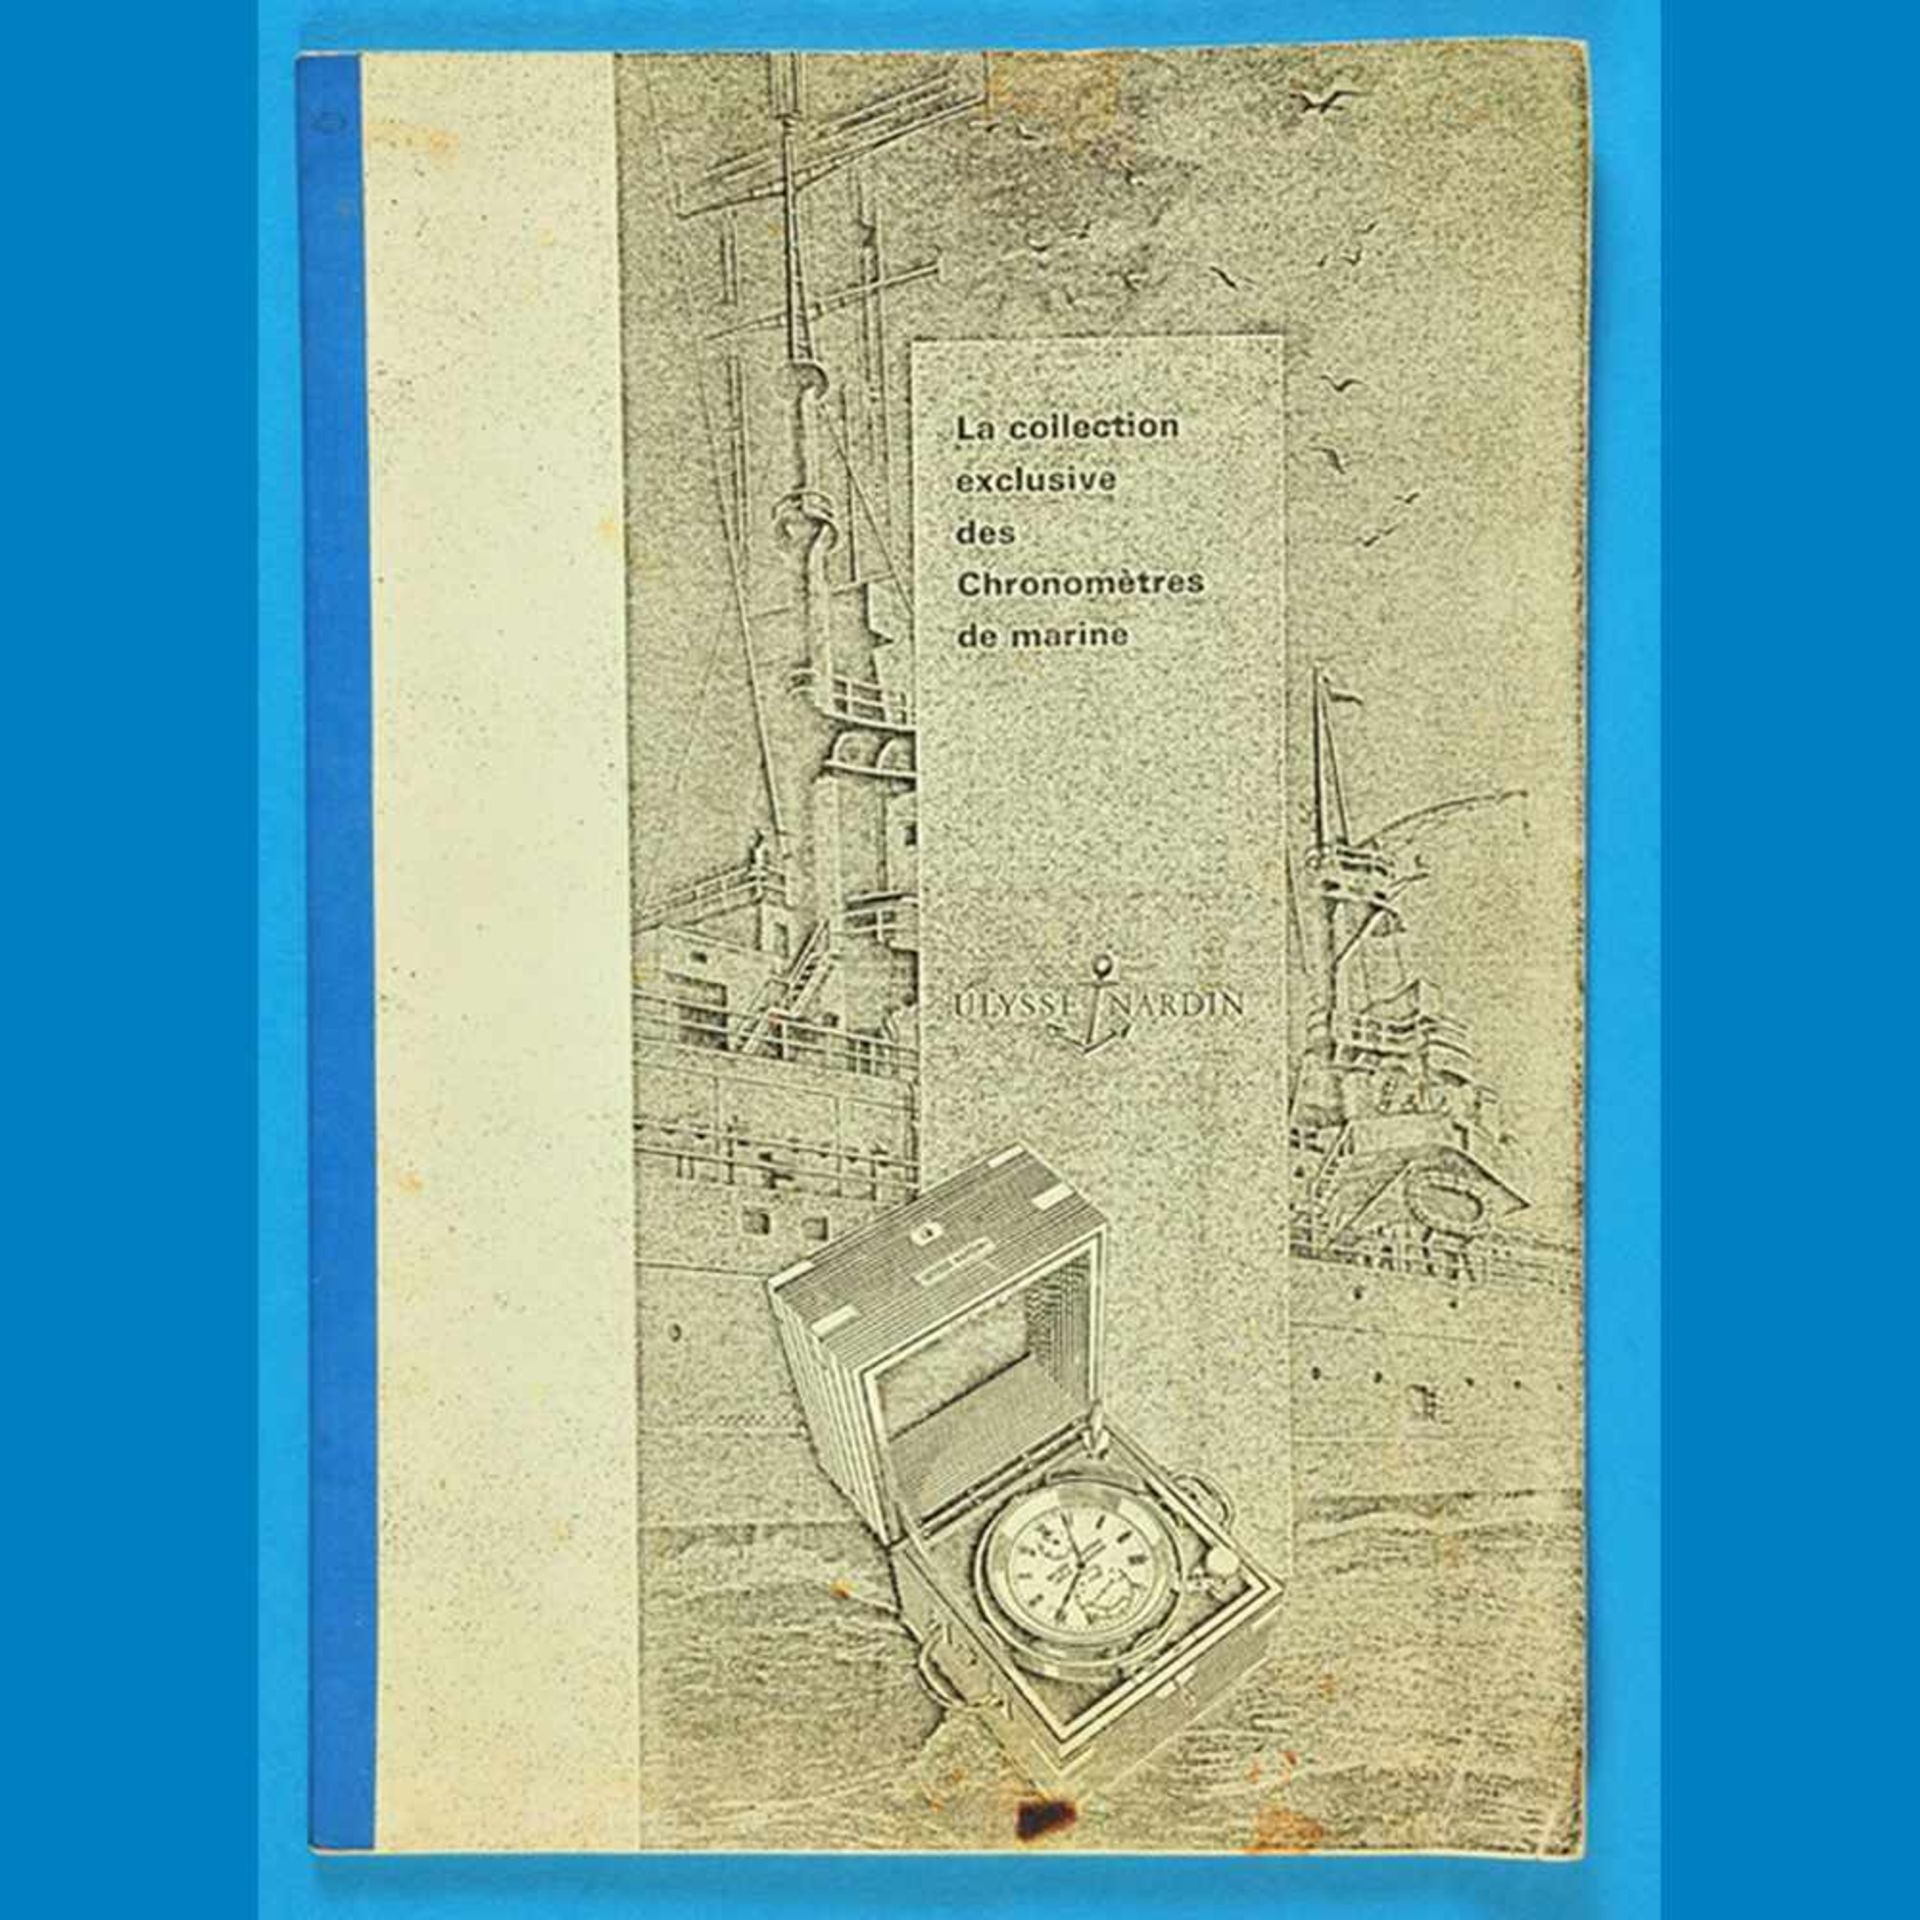 Ulysse Nardin,La Collection exclusive des Chronomètres de marineUlysse Nardin,La Collection